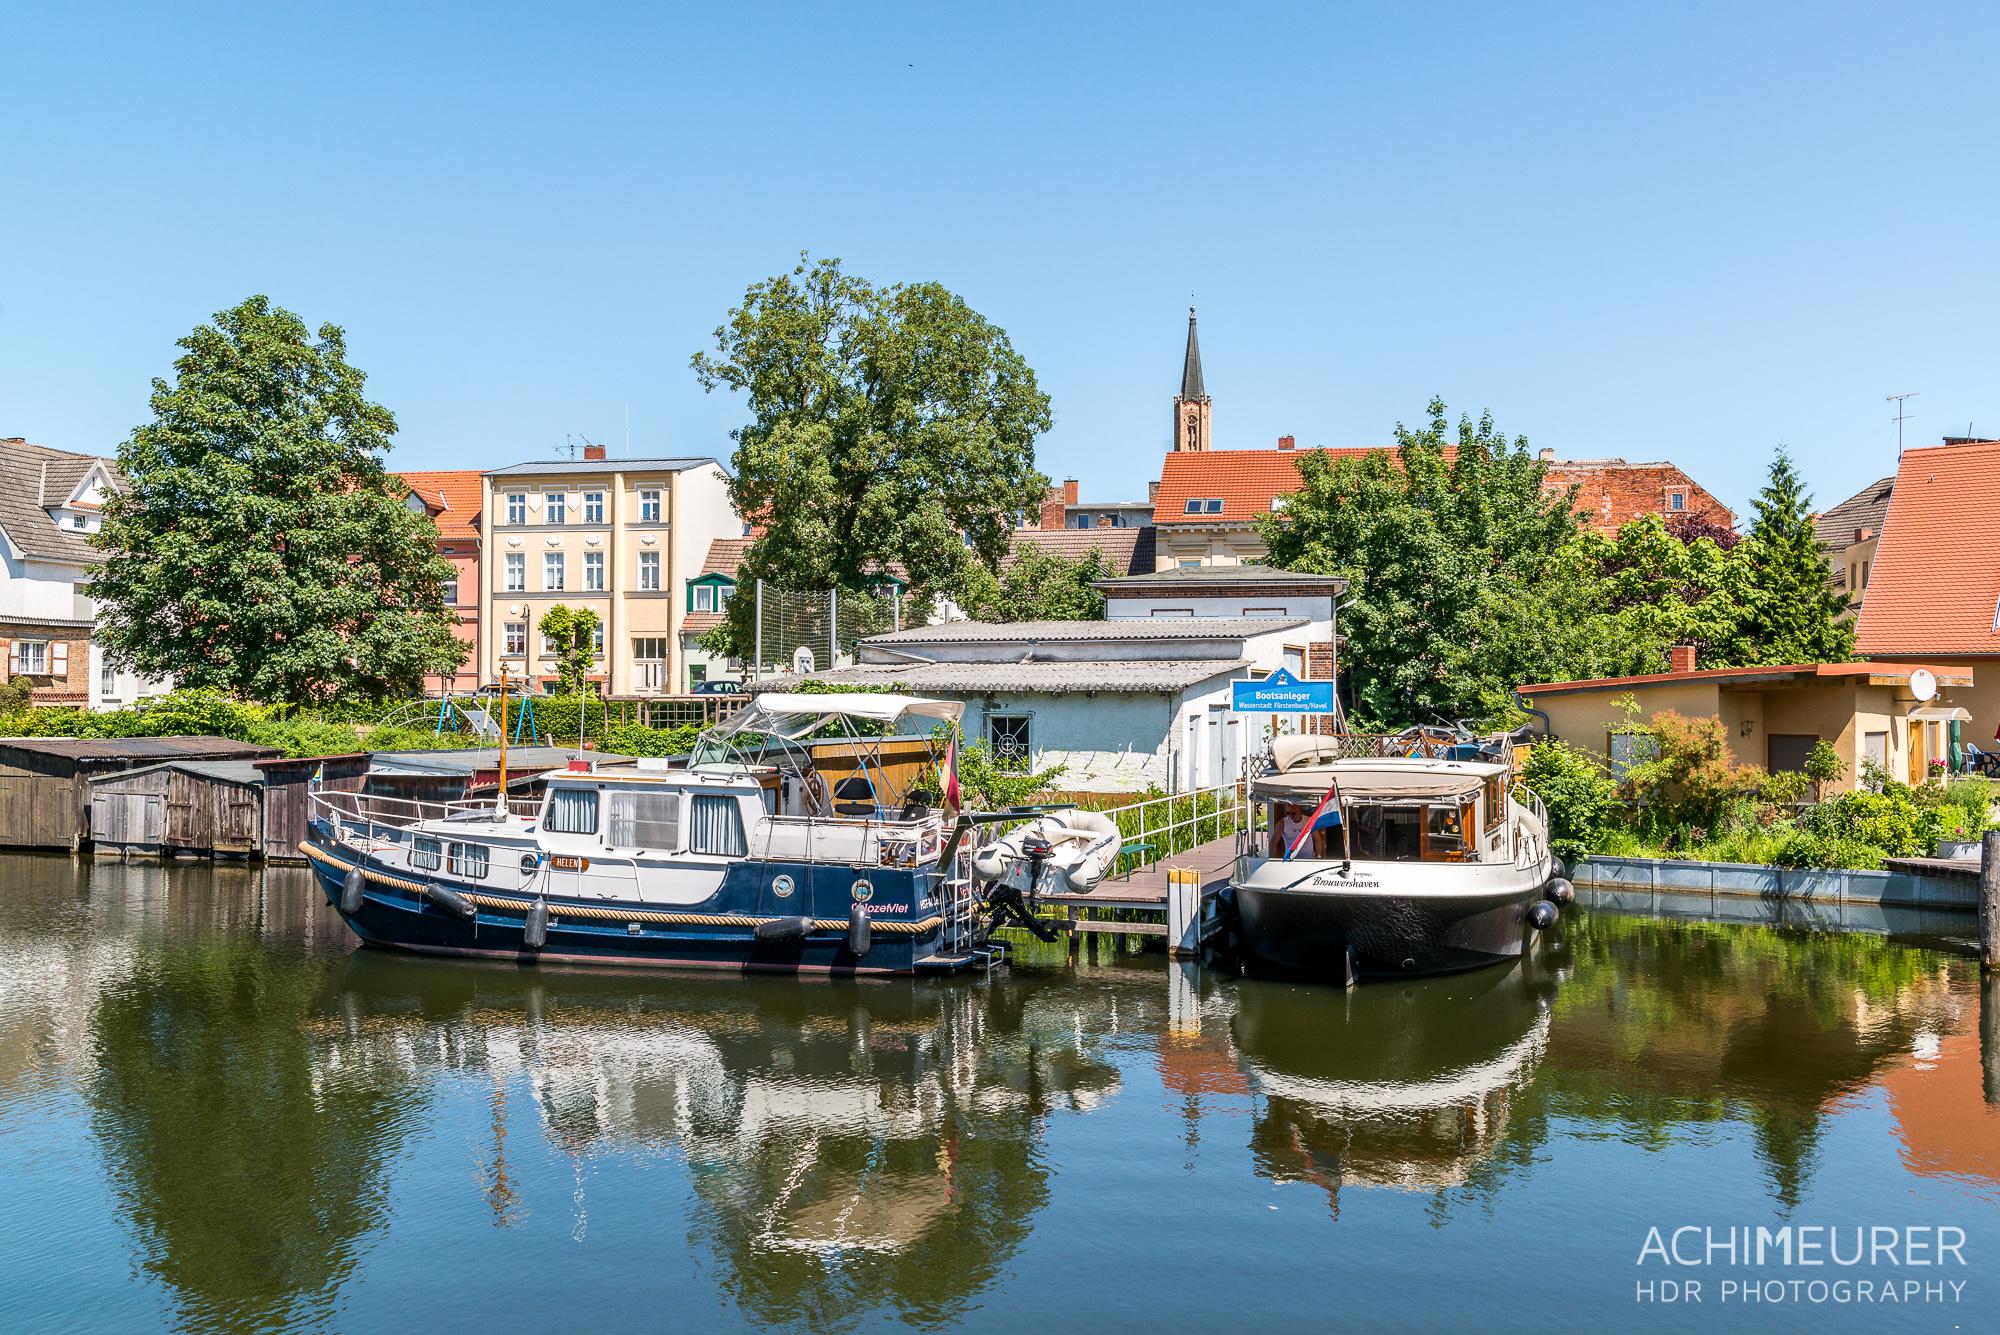 Hausboot-Kuhnle-Mueritz-Mecklenburg-Vorpommern-See_3160